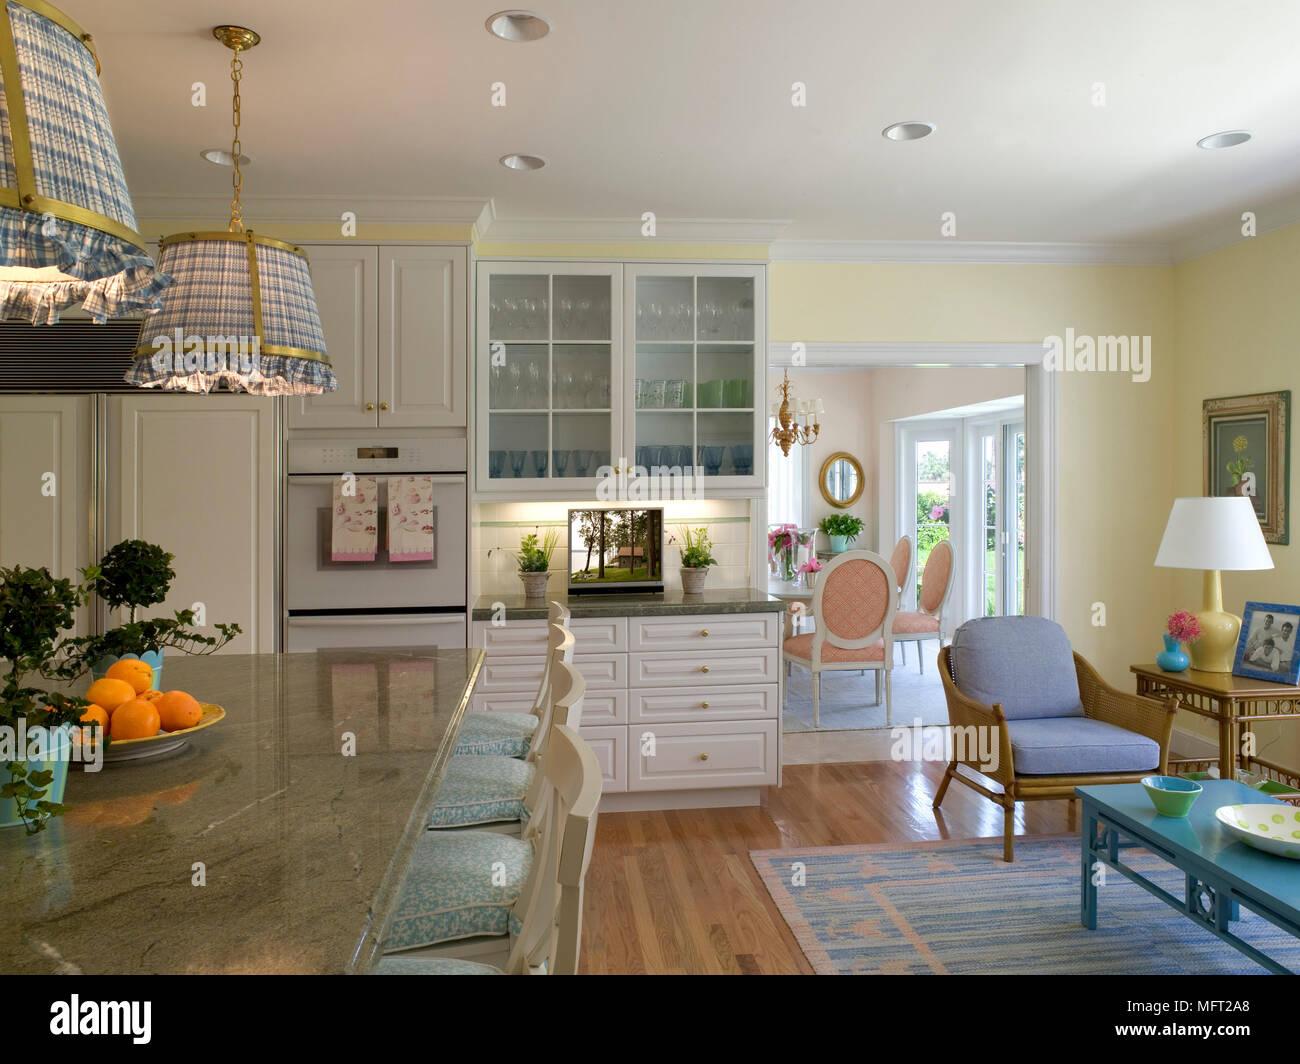 Un moderno e cucina a pianta aperta con zona pranzo, tavola di marmo ...